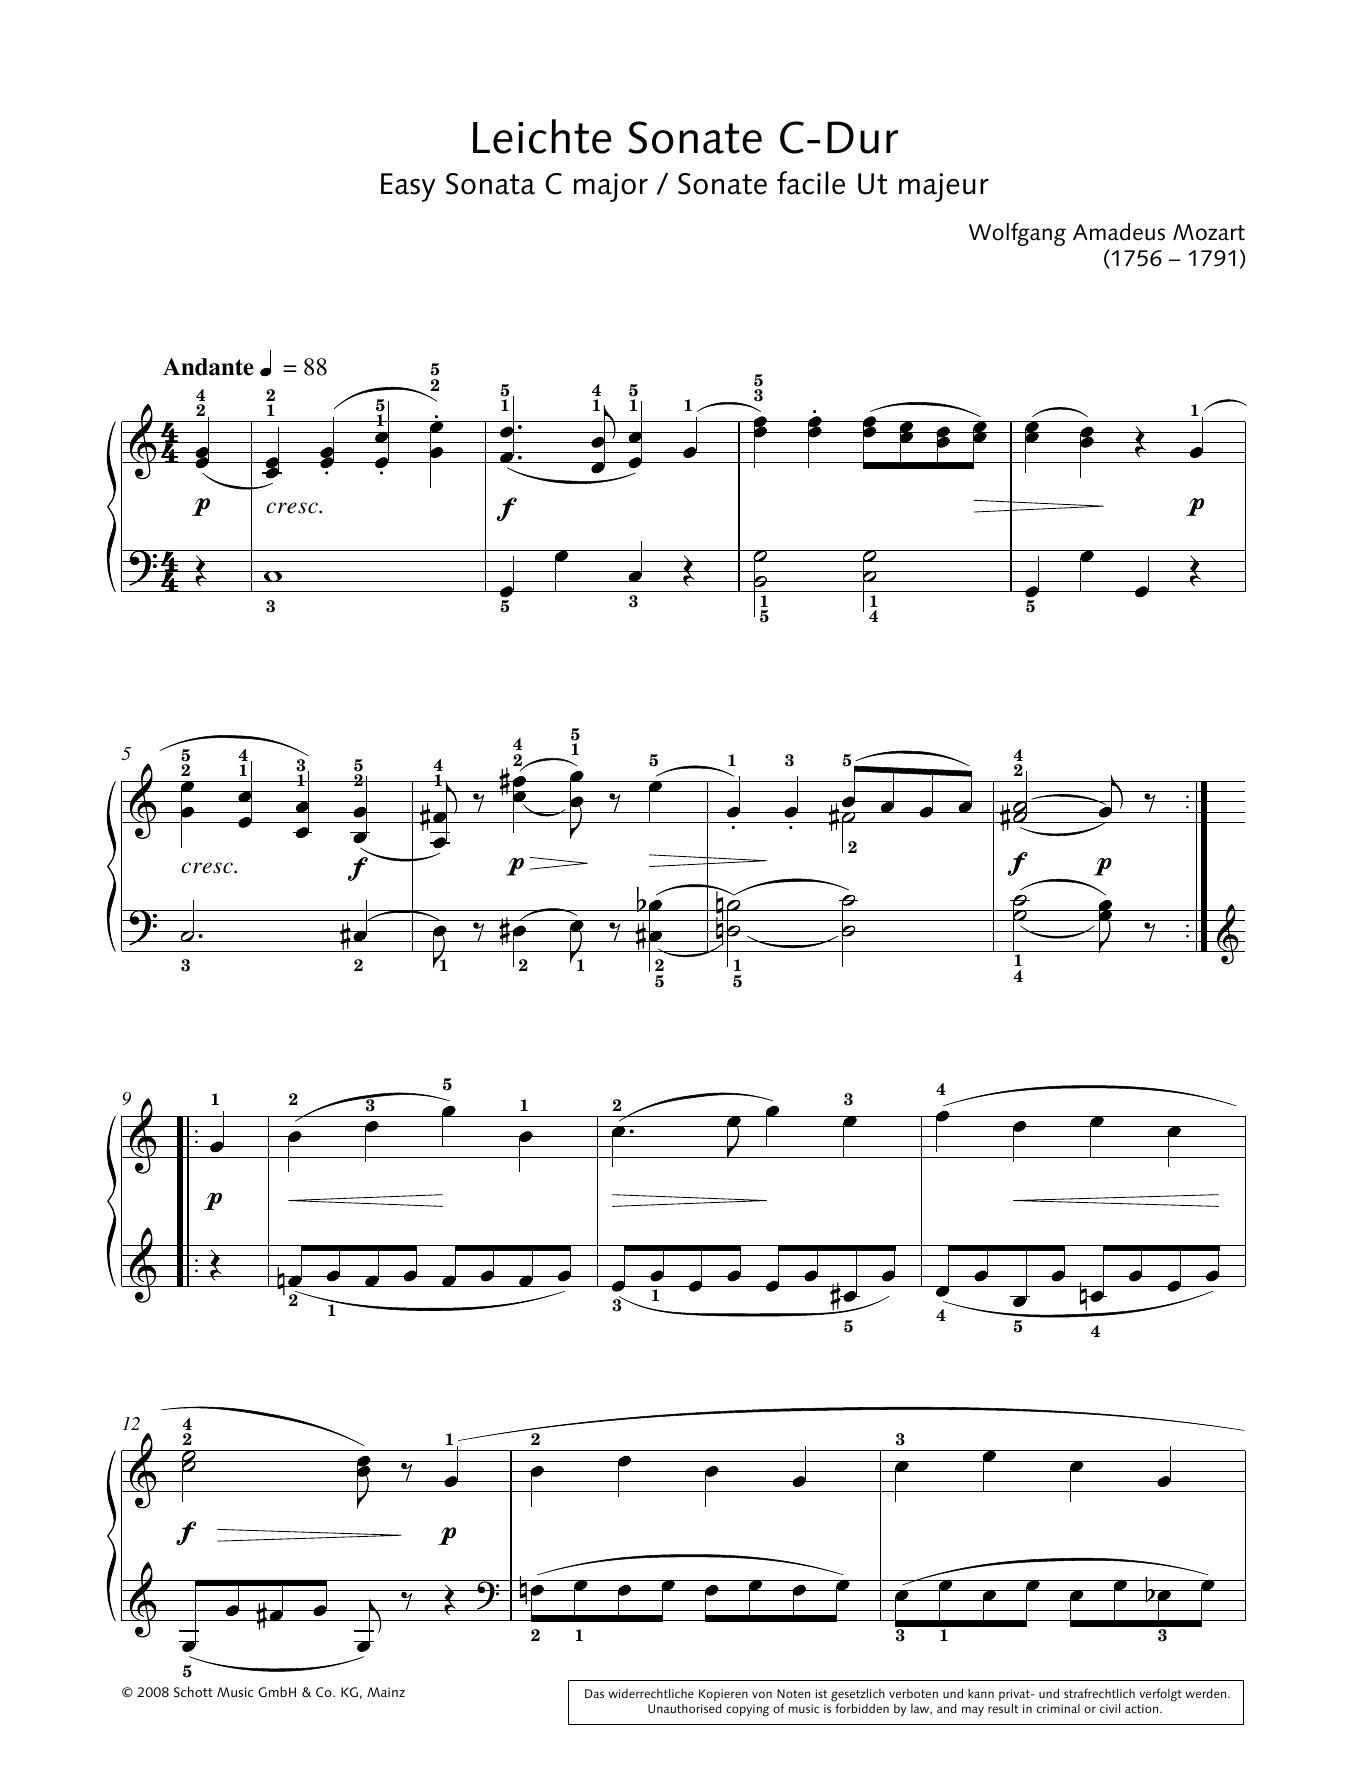 Easy Sonata in C major Sheet Music